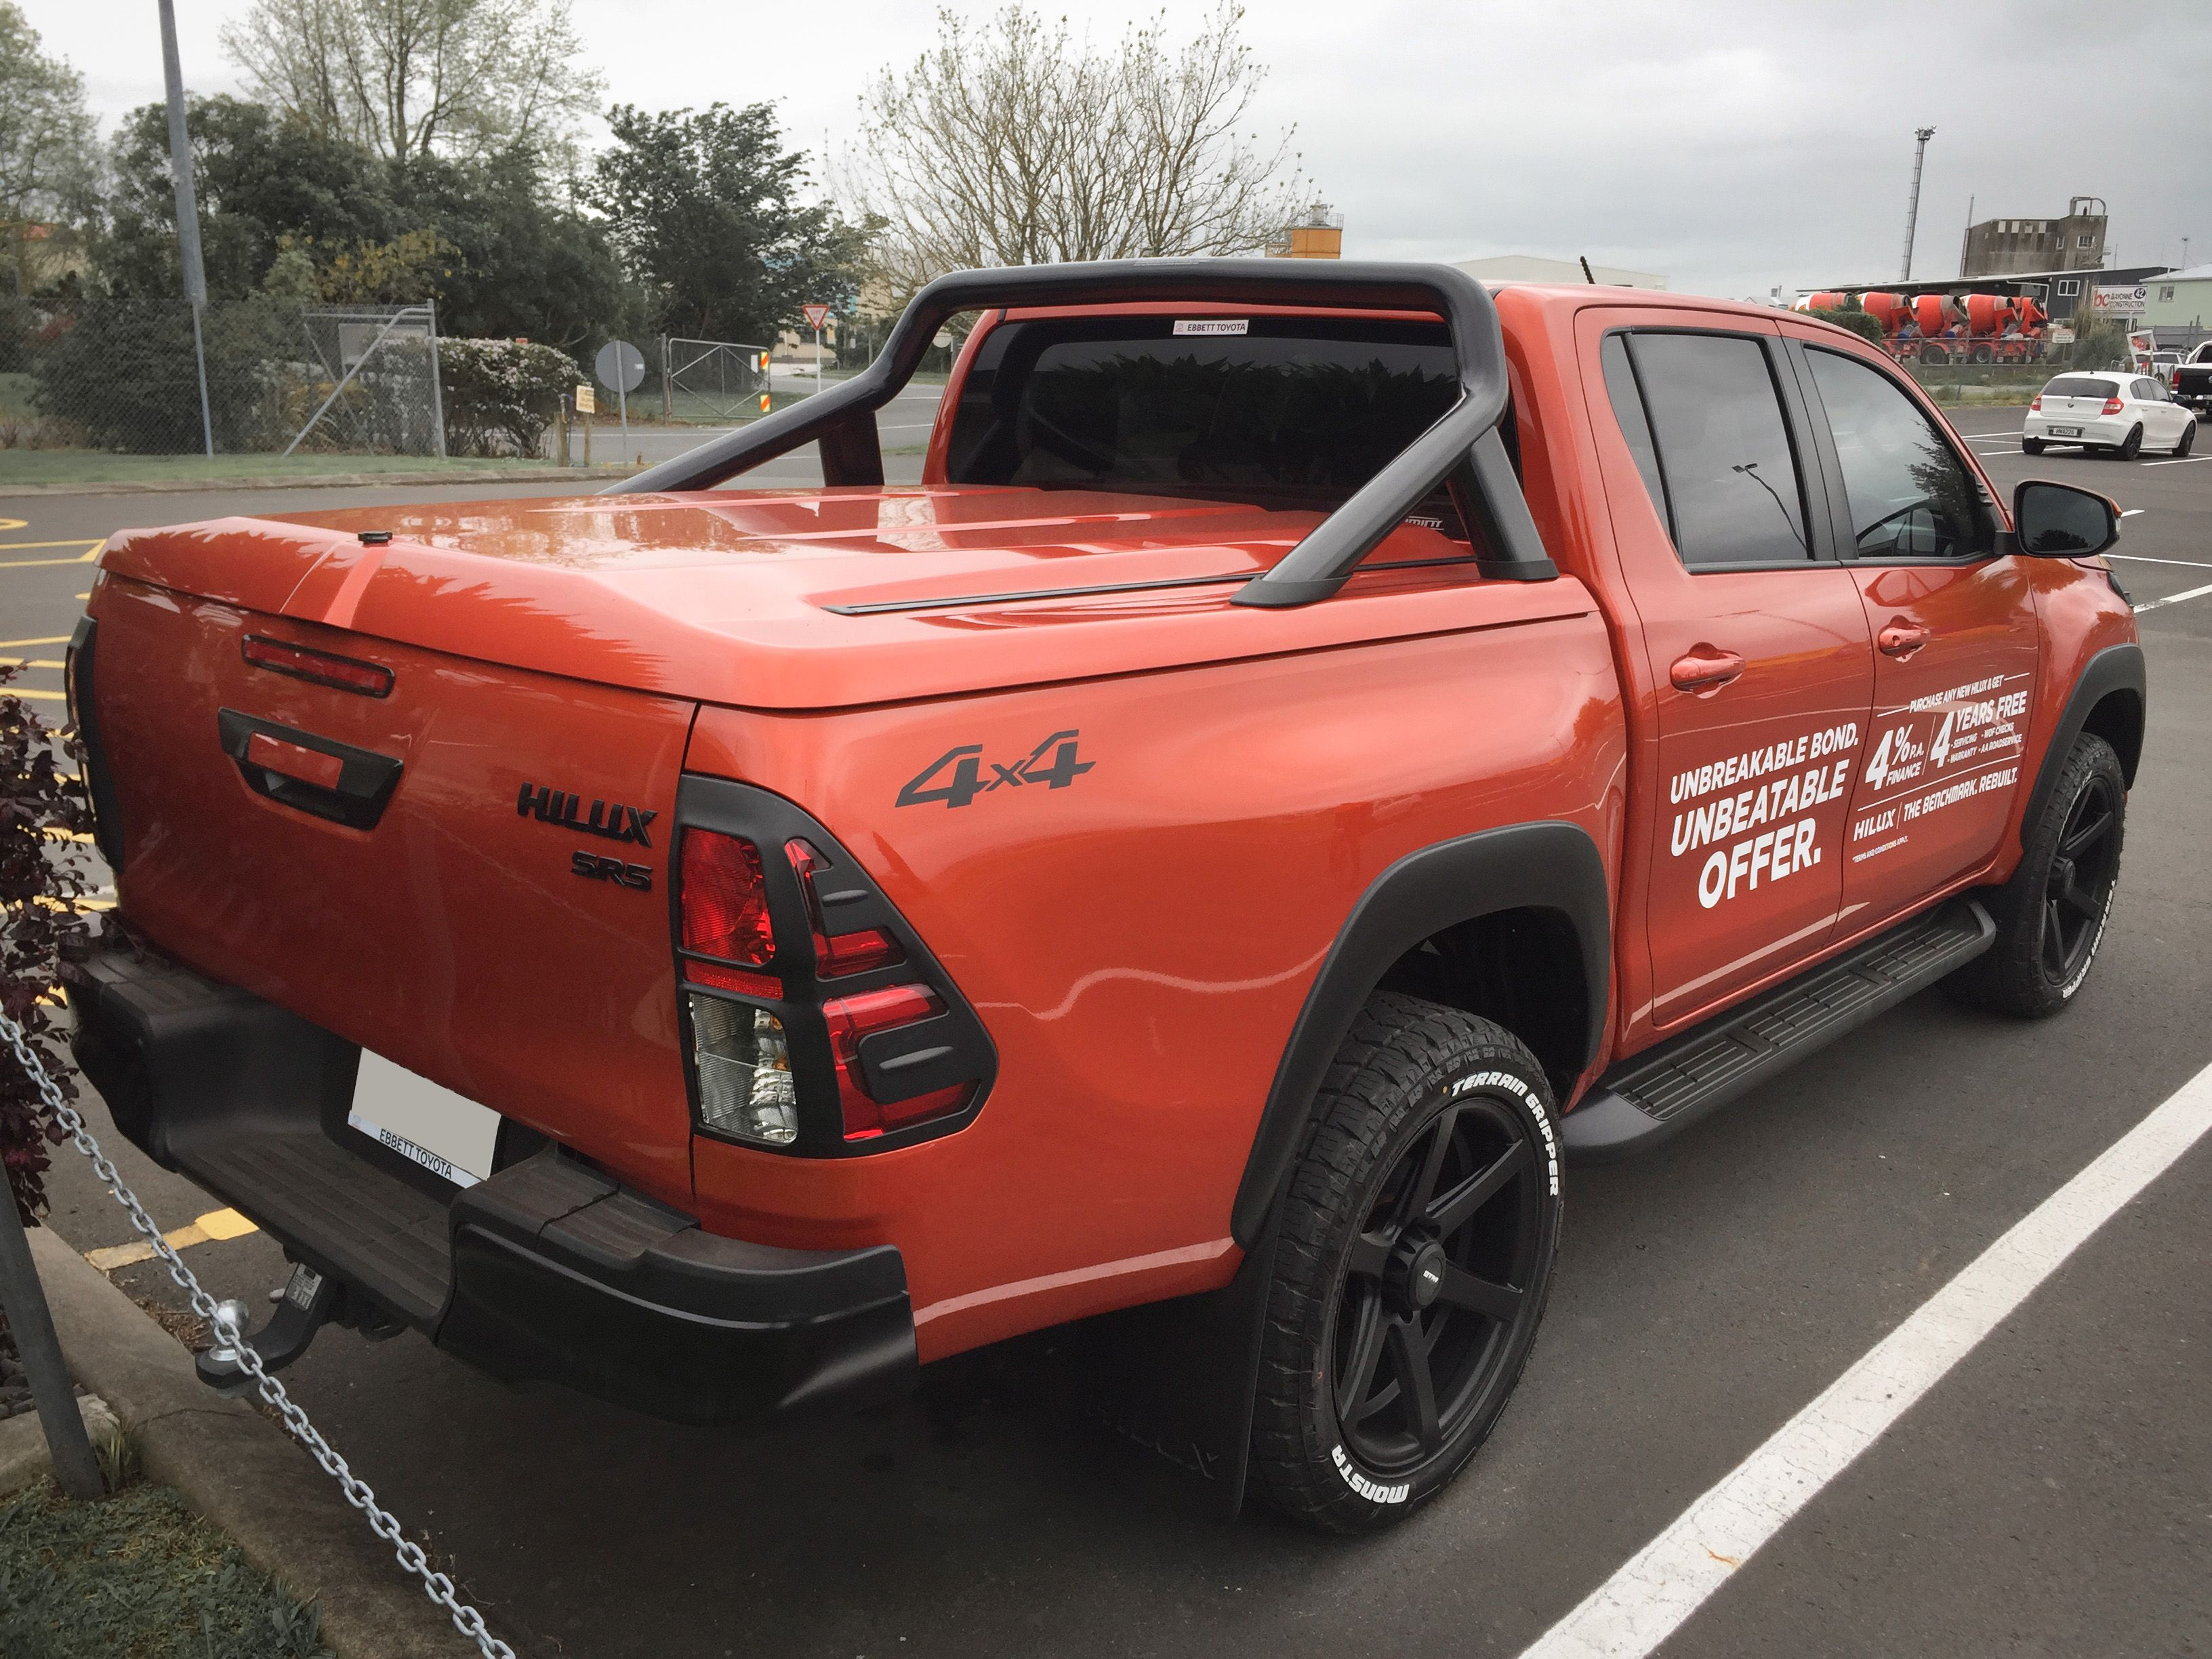 Sportlid For Tango ピックアップトラック ハイラックス 車